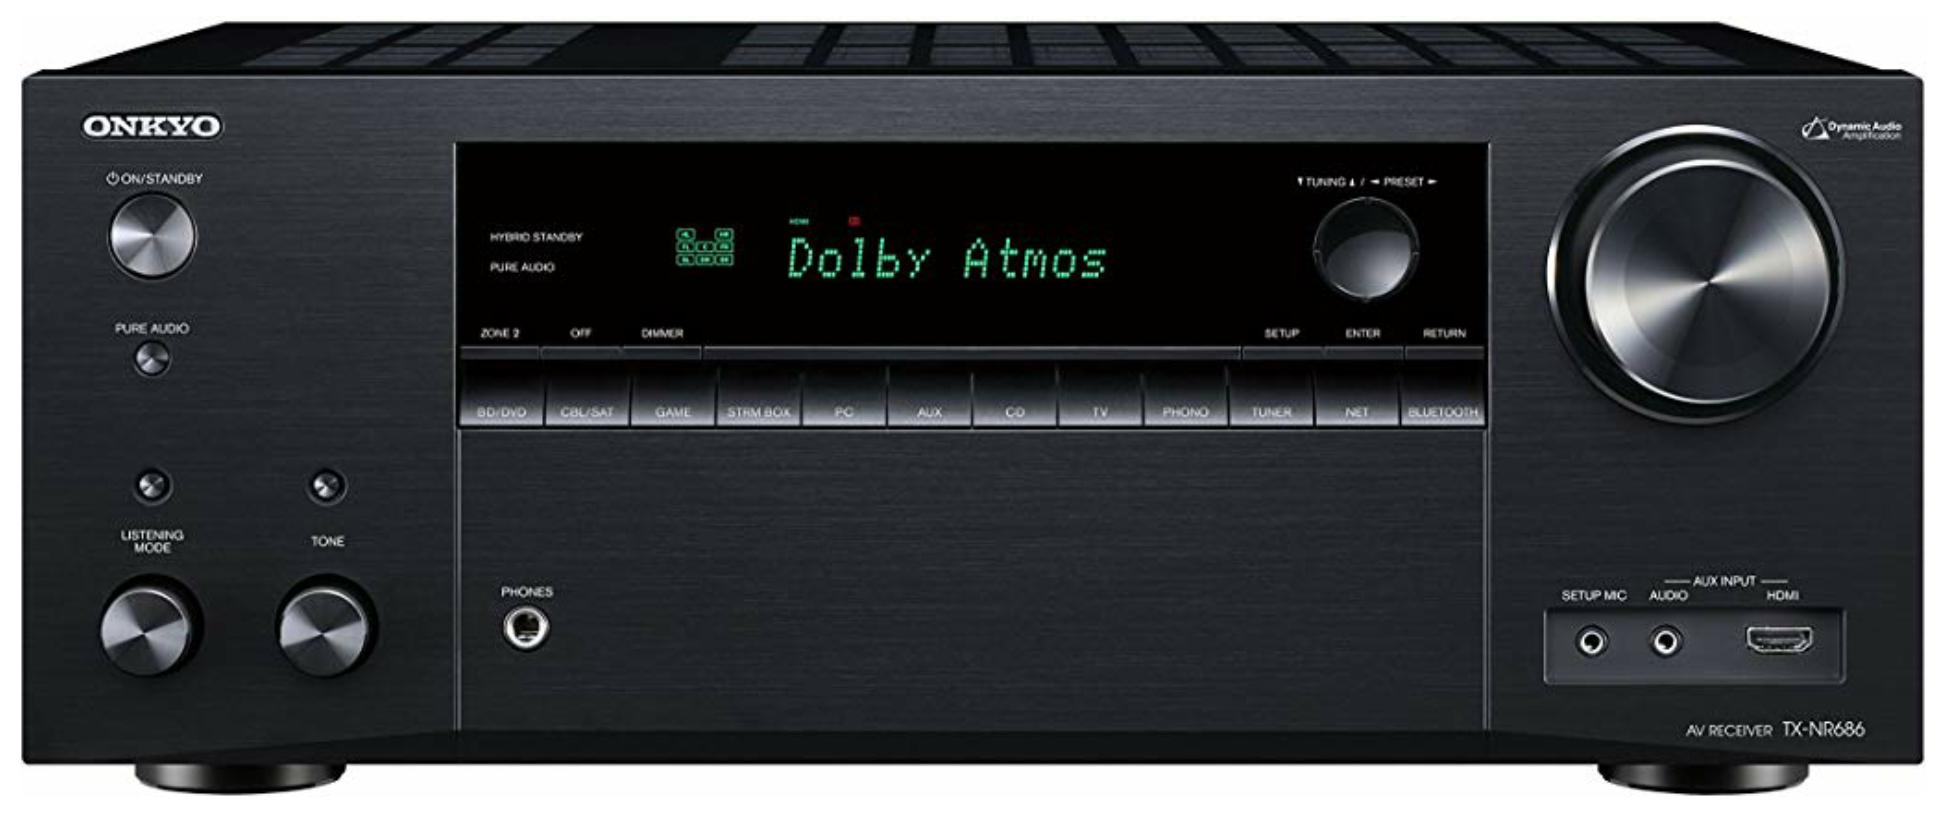 Onkyo TX-NR686(B) 7.2 Kanal AV Receiver (THX Kinoklang, Dolby/DTS:X, WLAN, Bluetooth, Radio, Multiroom, 165 W/Kanal), Schwarz